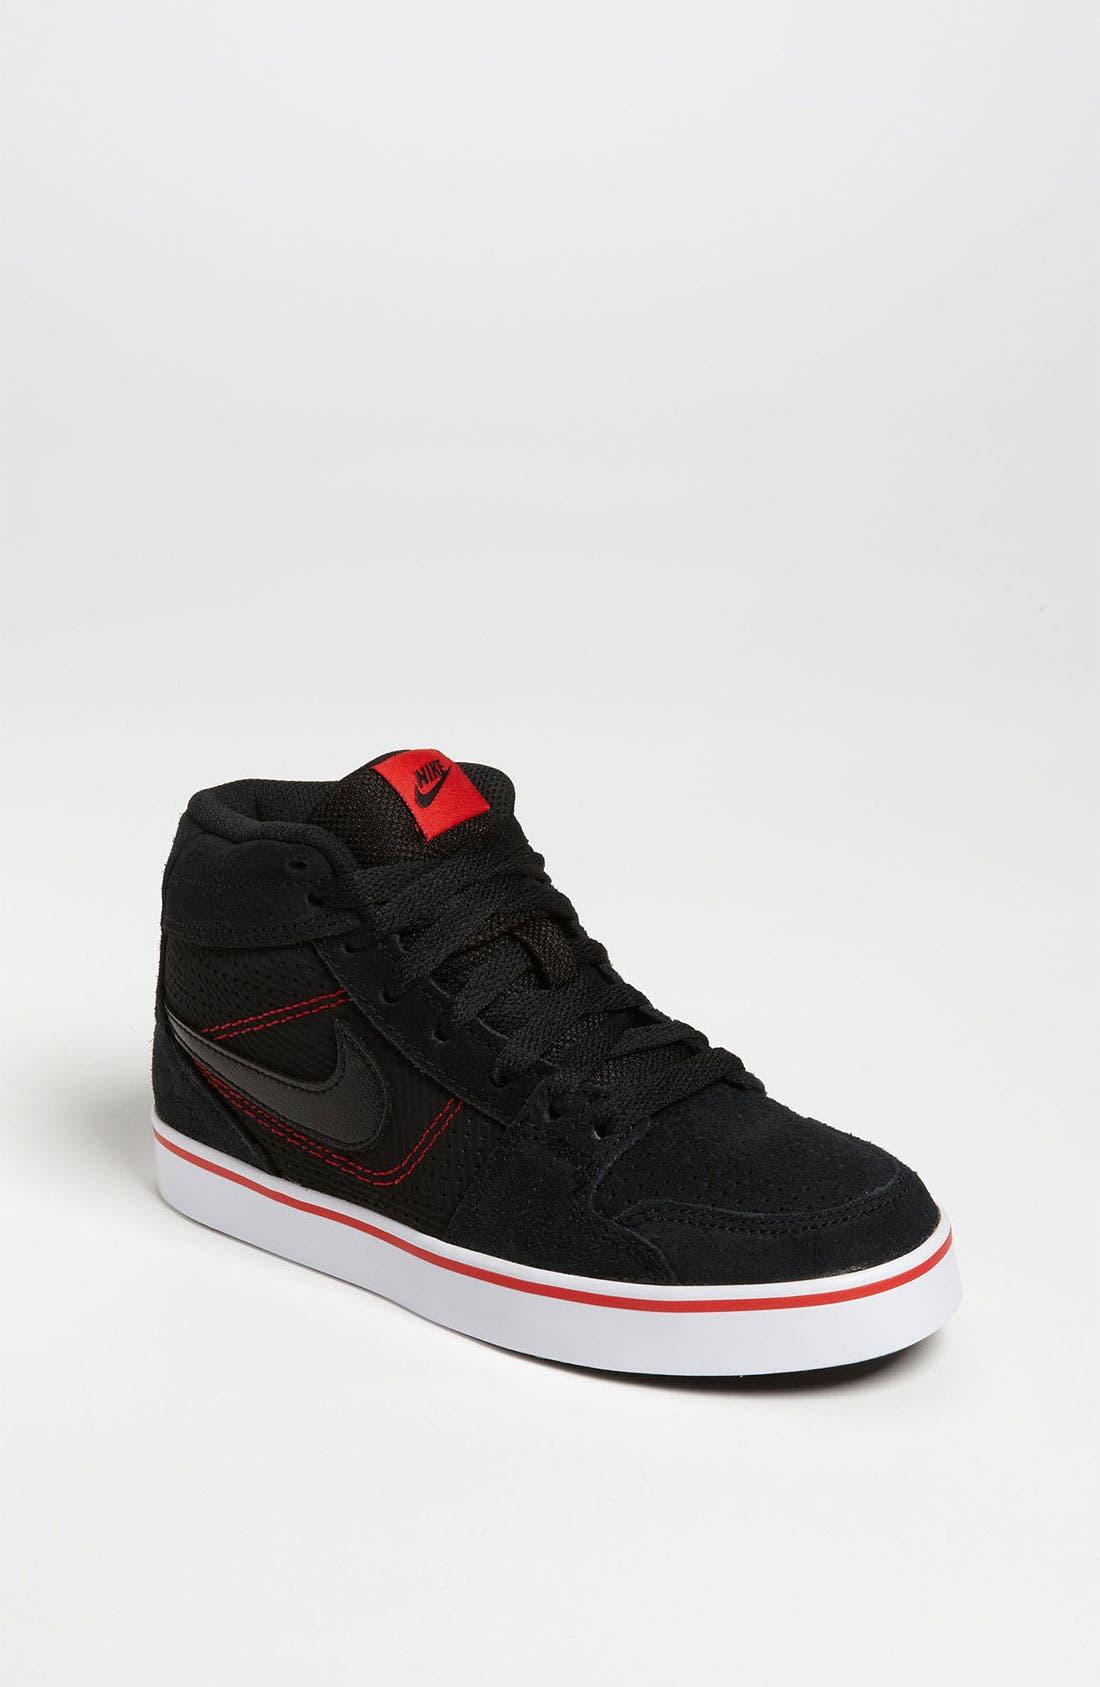 Main Image - Nike 'Ruckus Mid Jr. 6.0' Sneaker (Toddler, Little Kid & Big Kid)